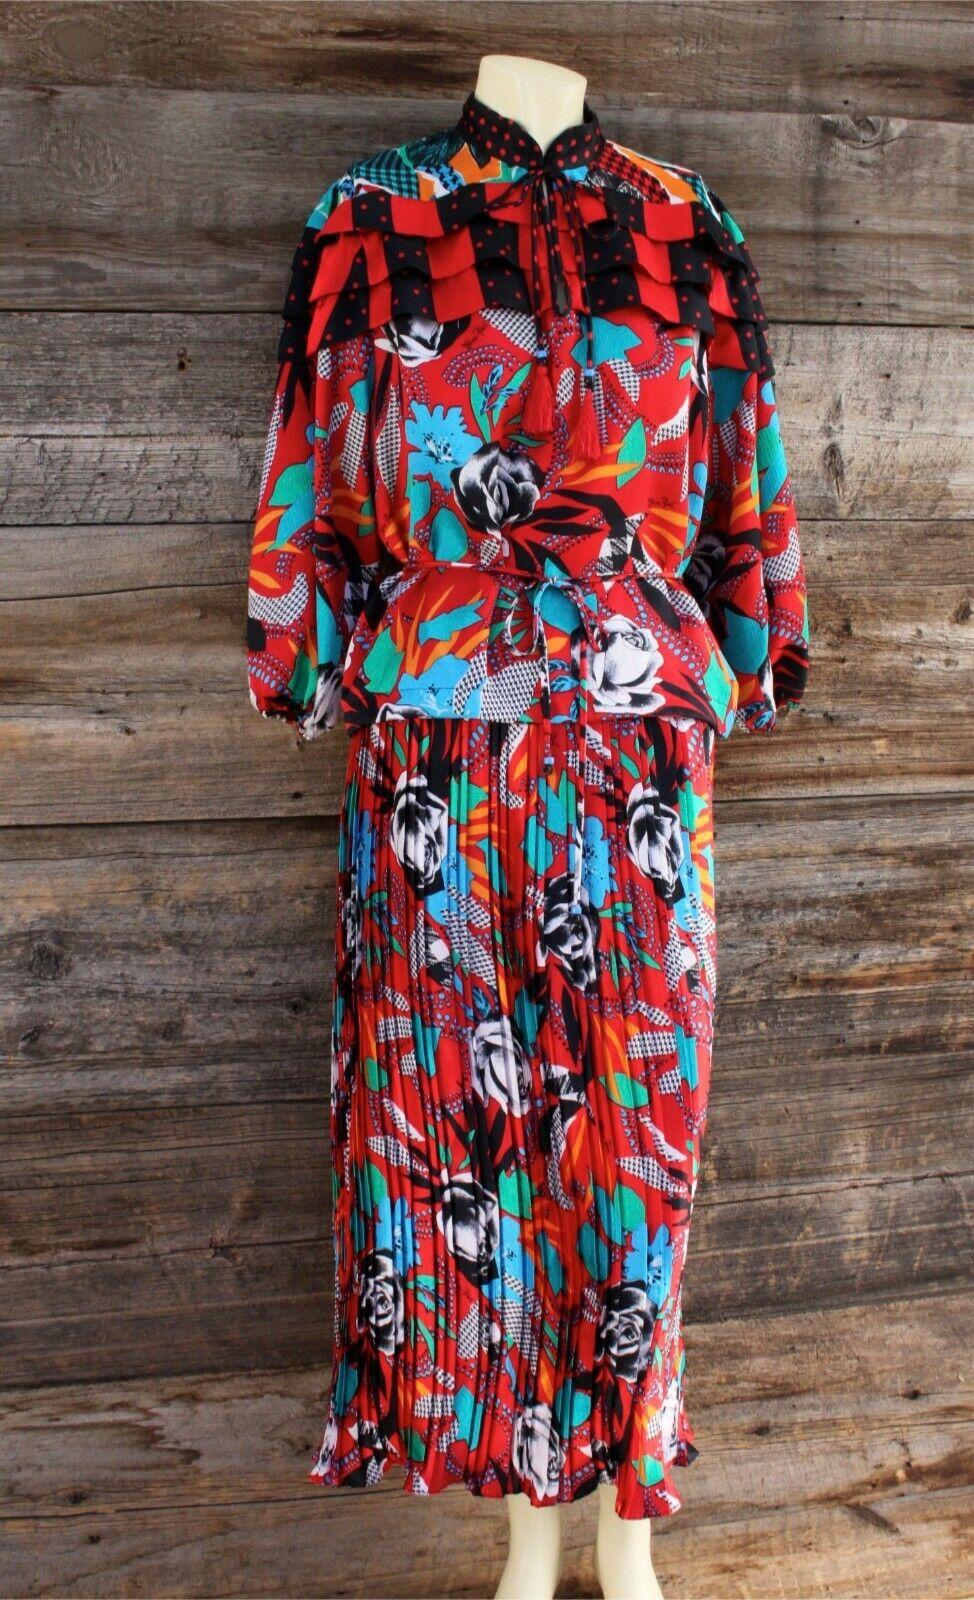 Vintage Diane Freis Two Piece Skirt & Top Dress w pinks Pattern One Size